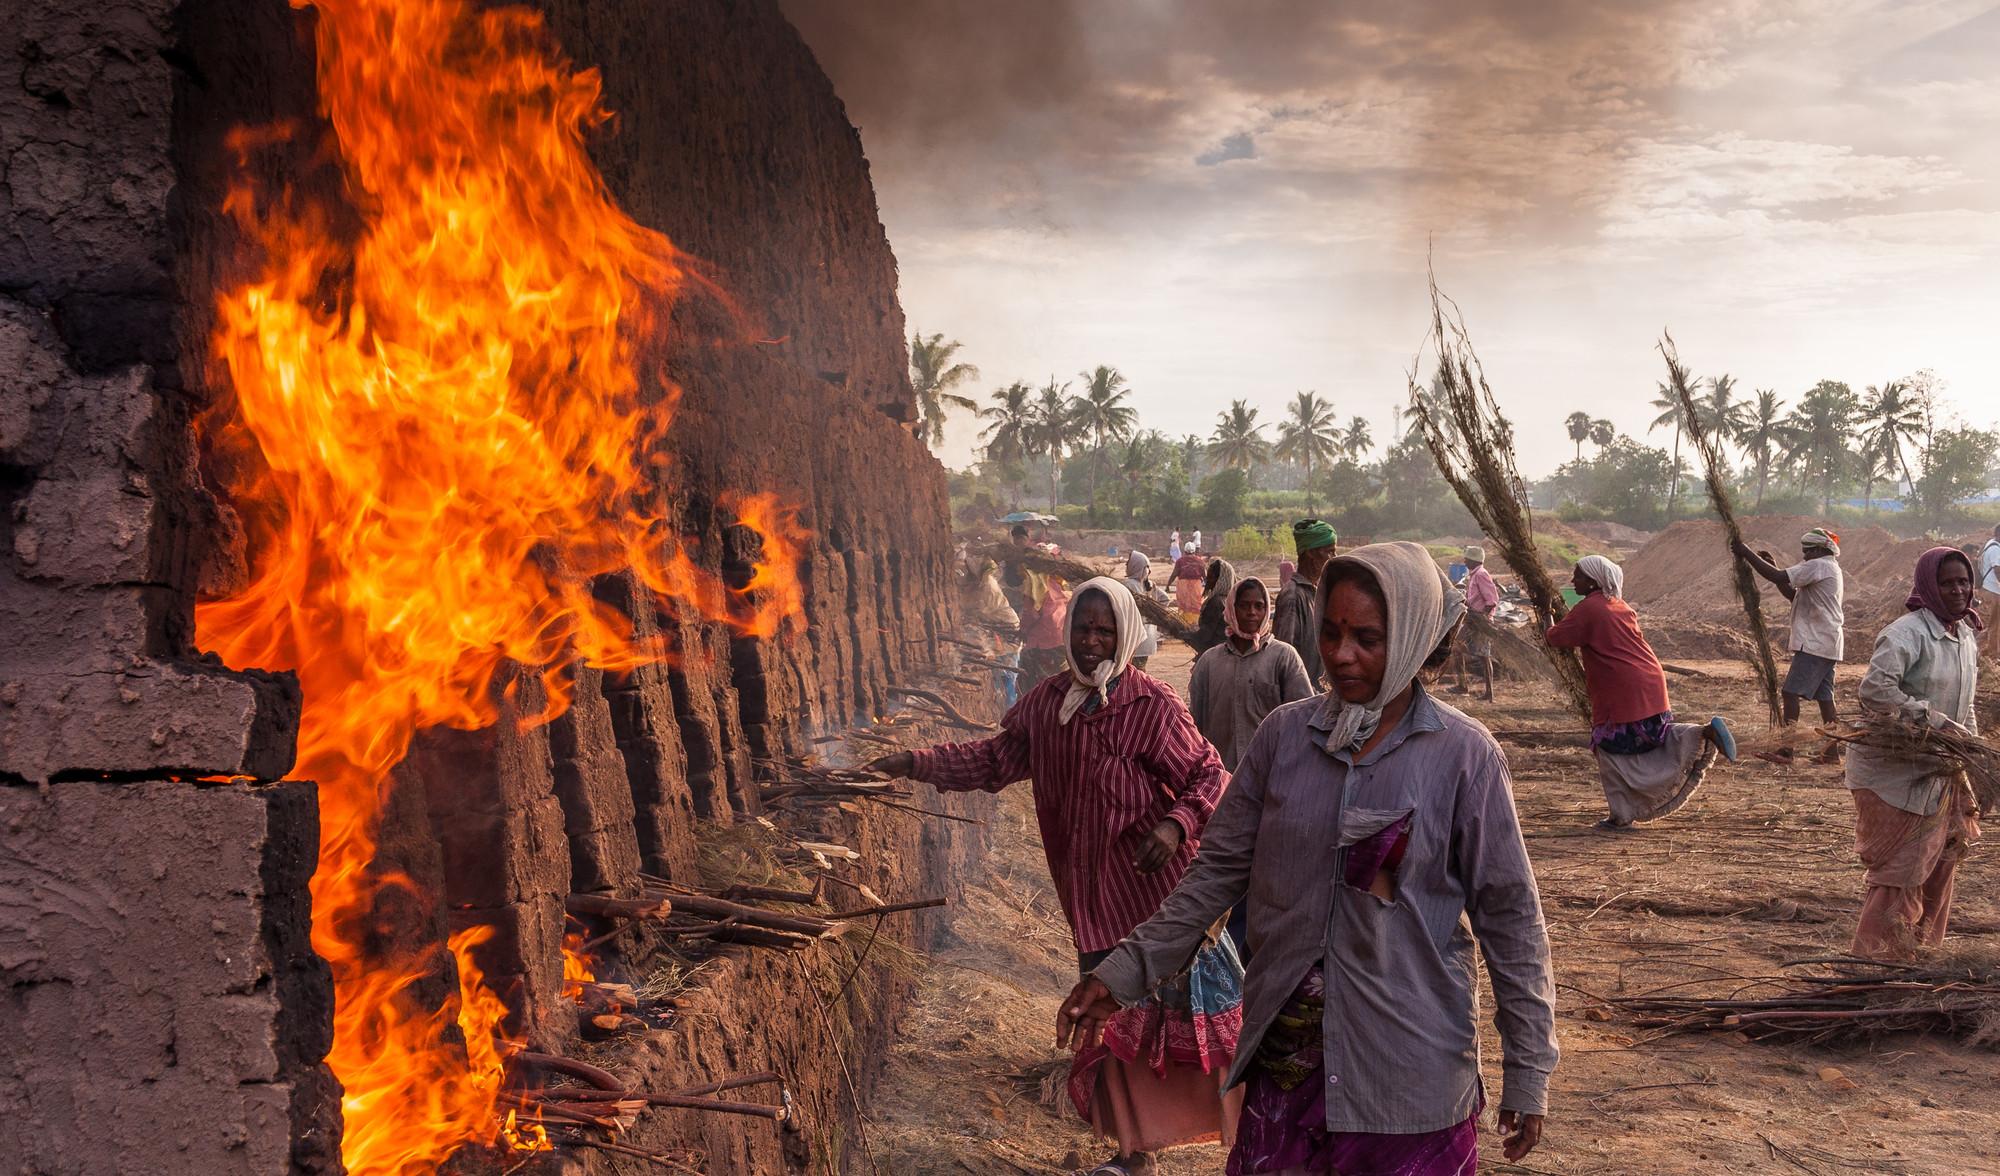 Near to fire for bricks. Image © Rajaram